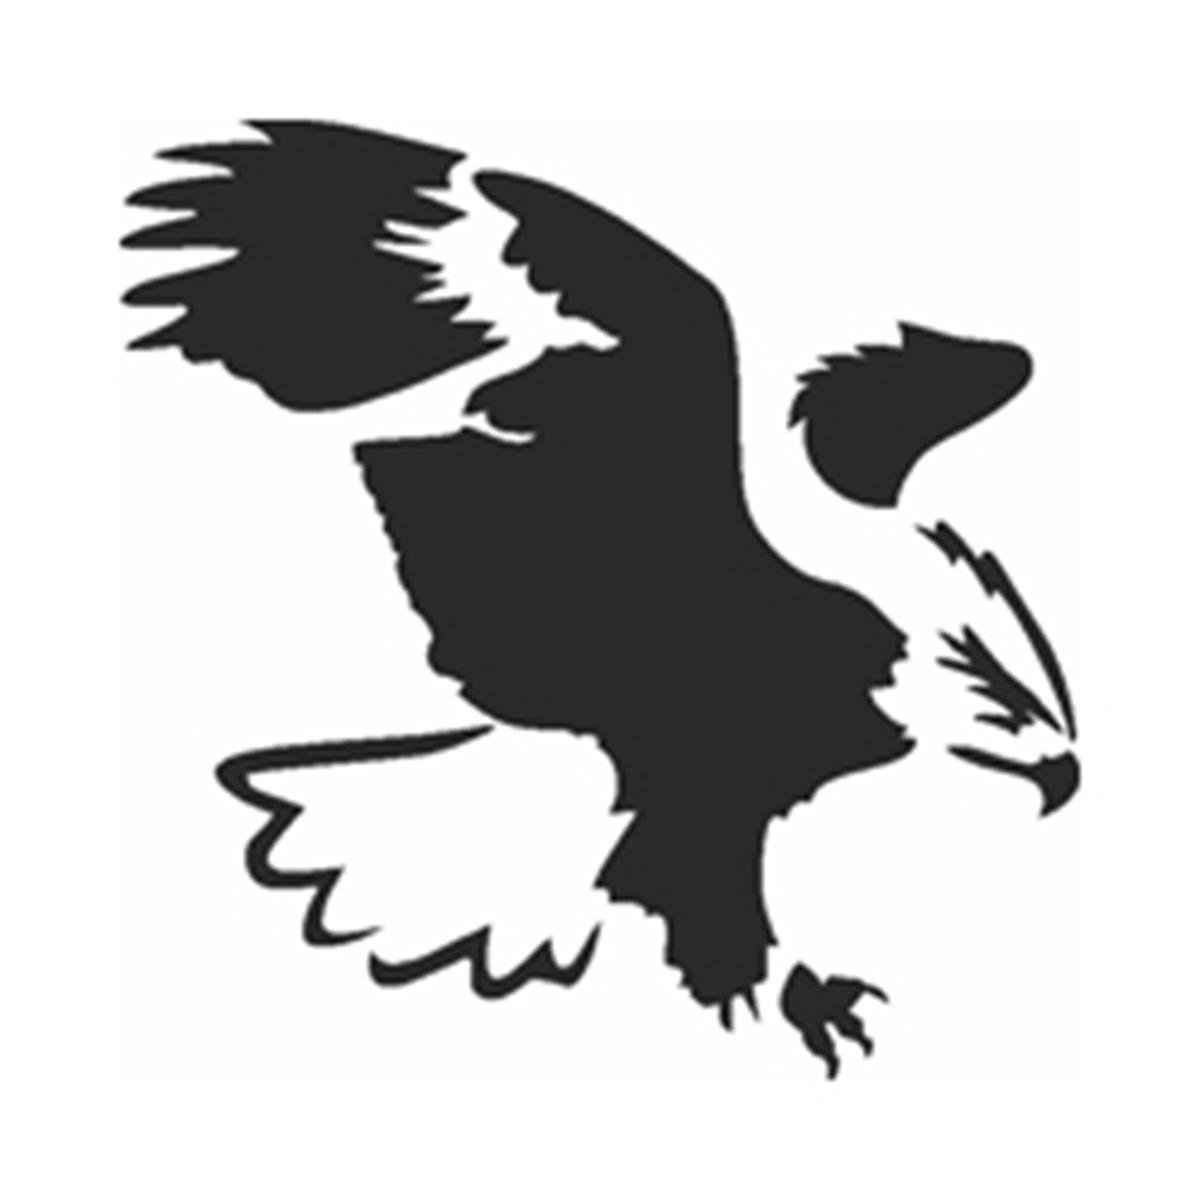 Adler Schablone